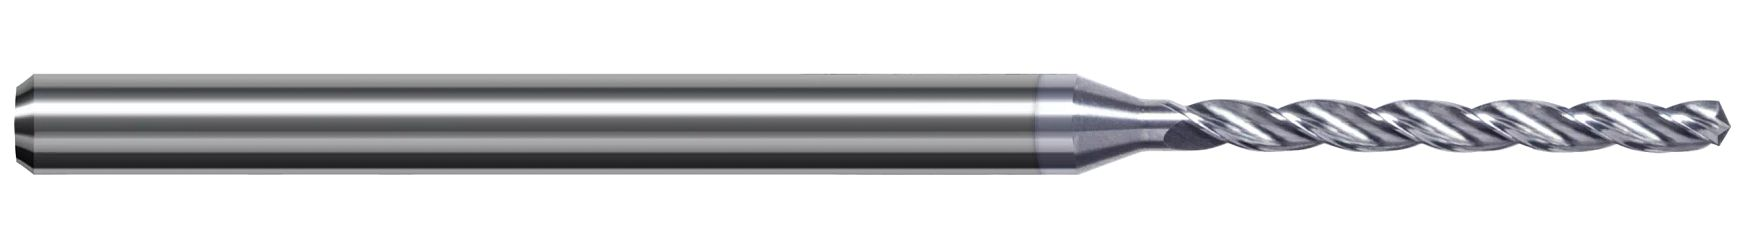 Miniature High Performance Drills - Aluminum Alloys